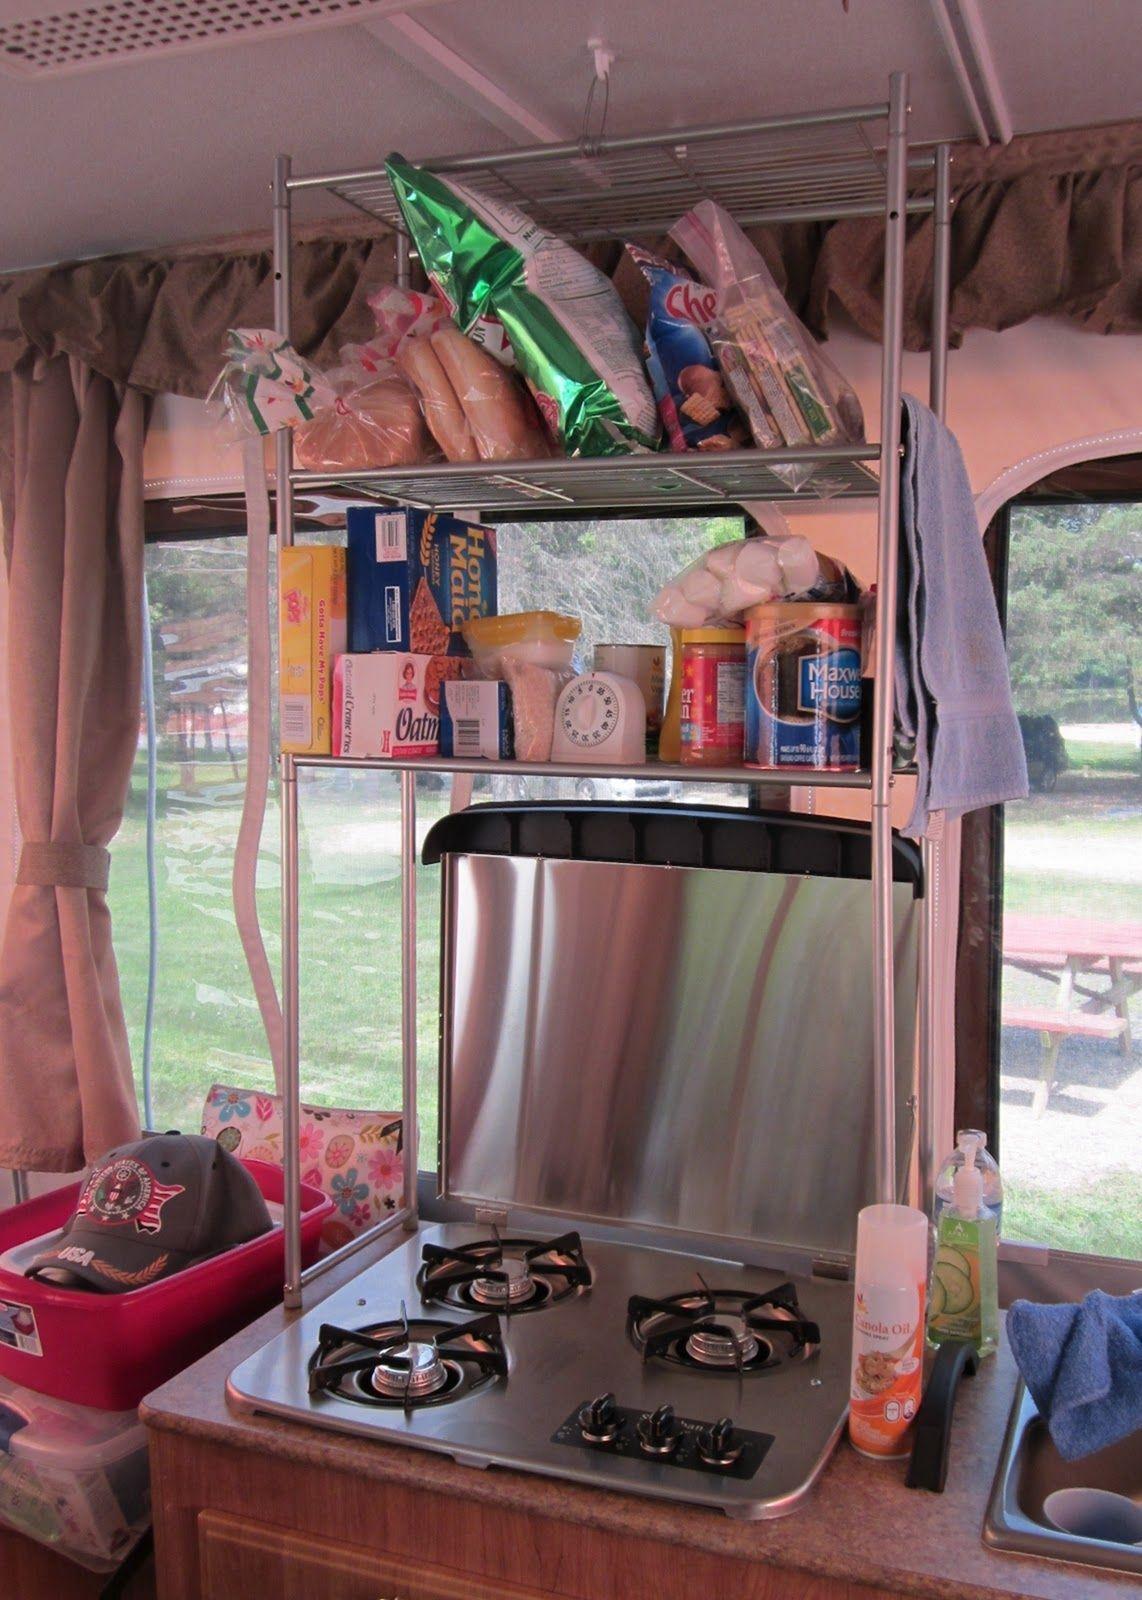 Best Ideas To Organize Your Rv Camper Nowaday 49